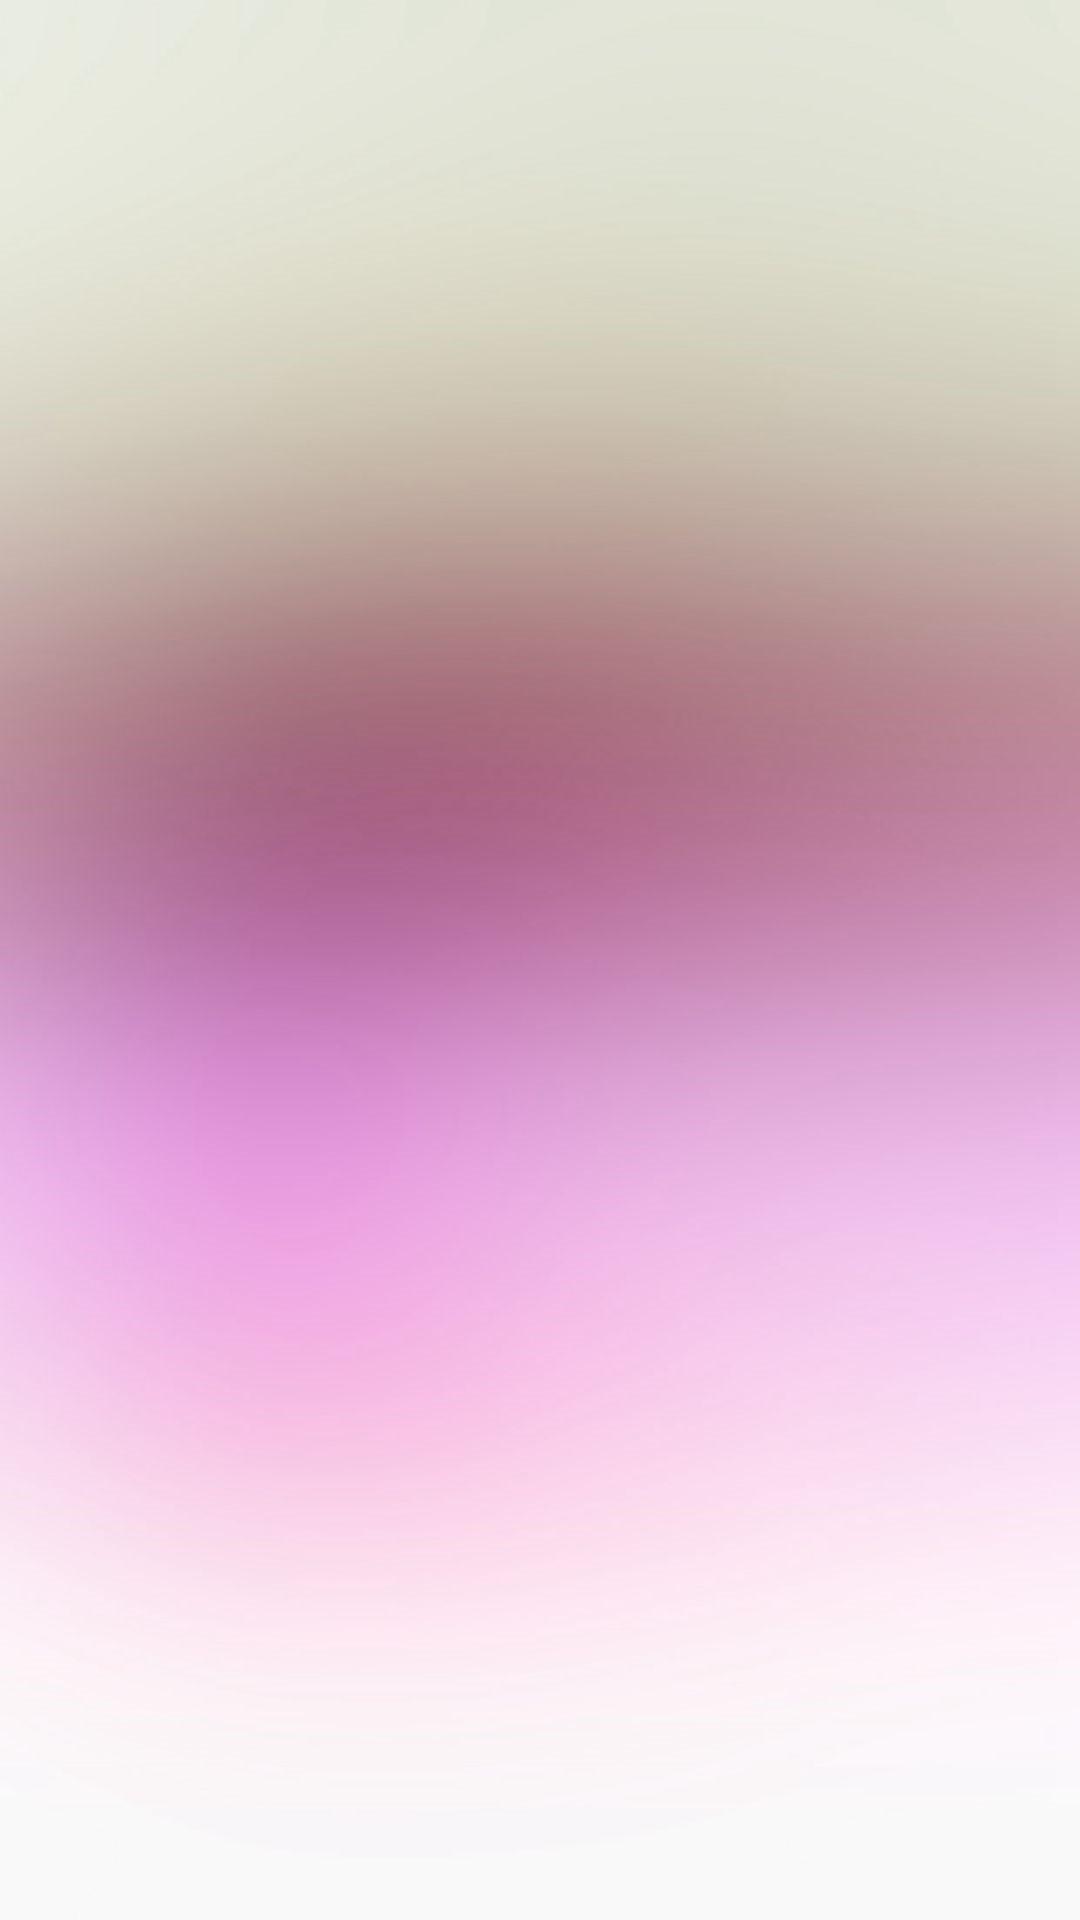 Ombre iPhone 6 wallpaper